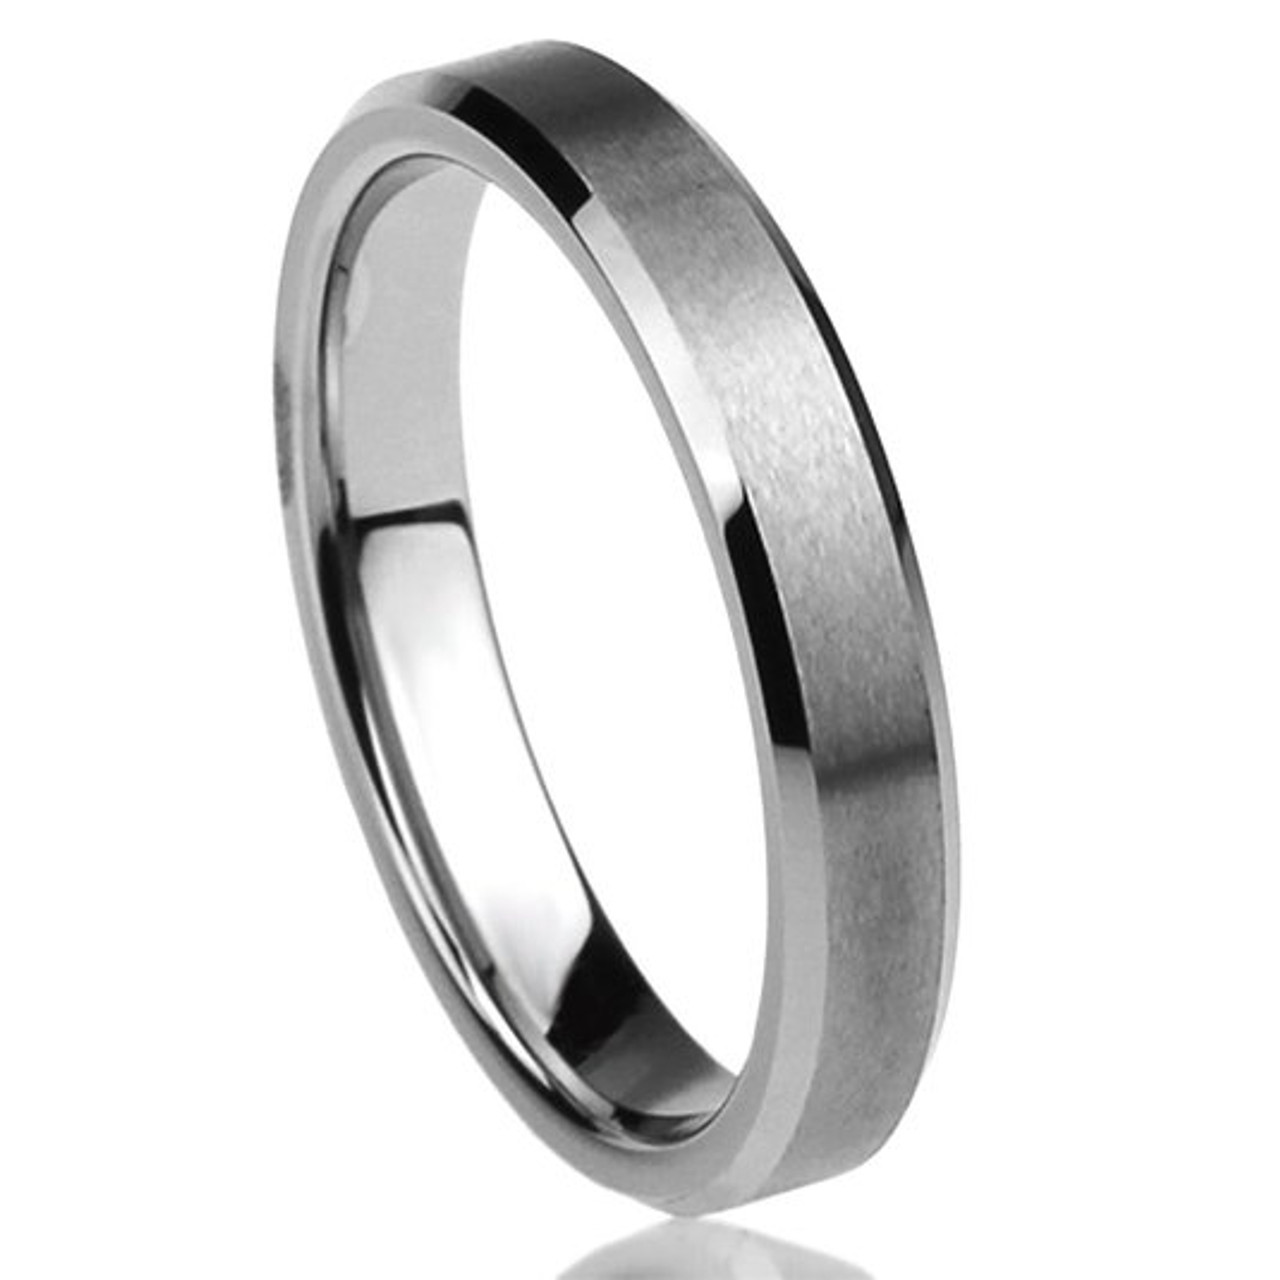 Bridal Stainless Steel Flat Beveled Edge 8mm Brushed and Polished Band